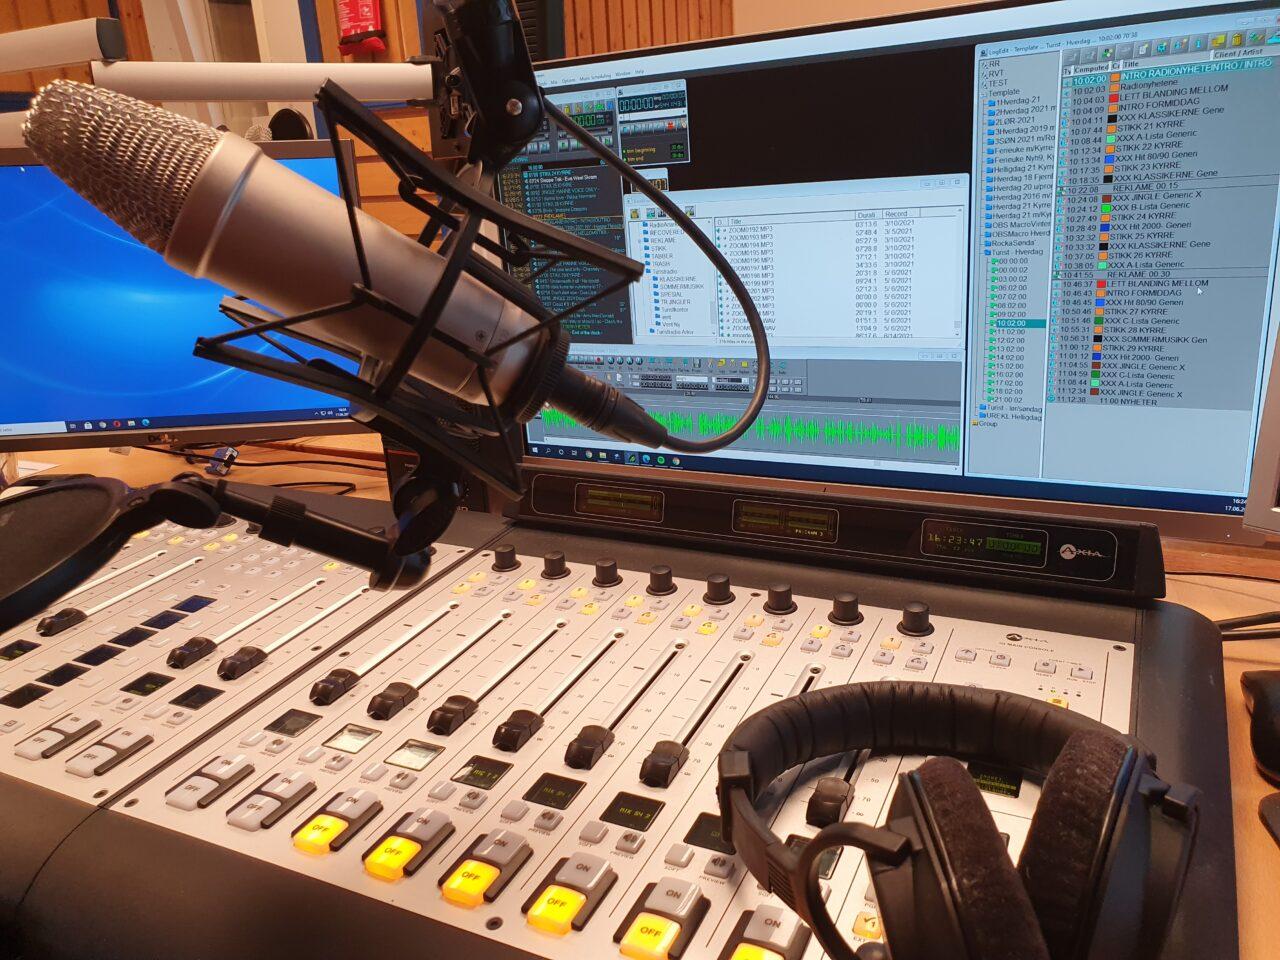 radio-teknisk-turistradio-1280x960.jpg